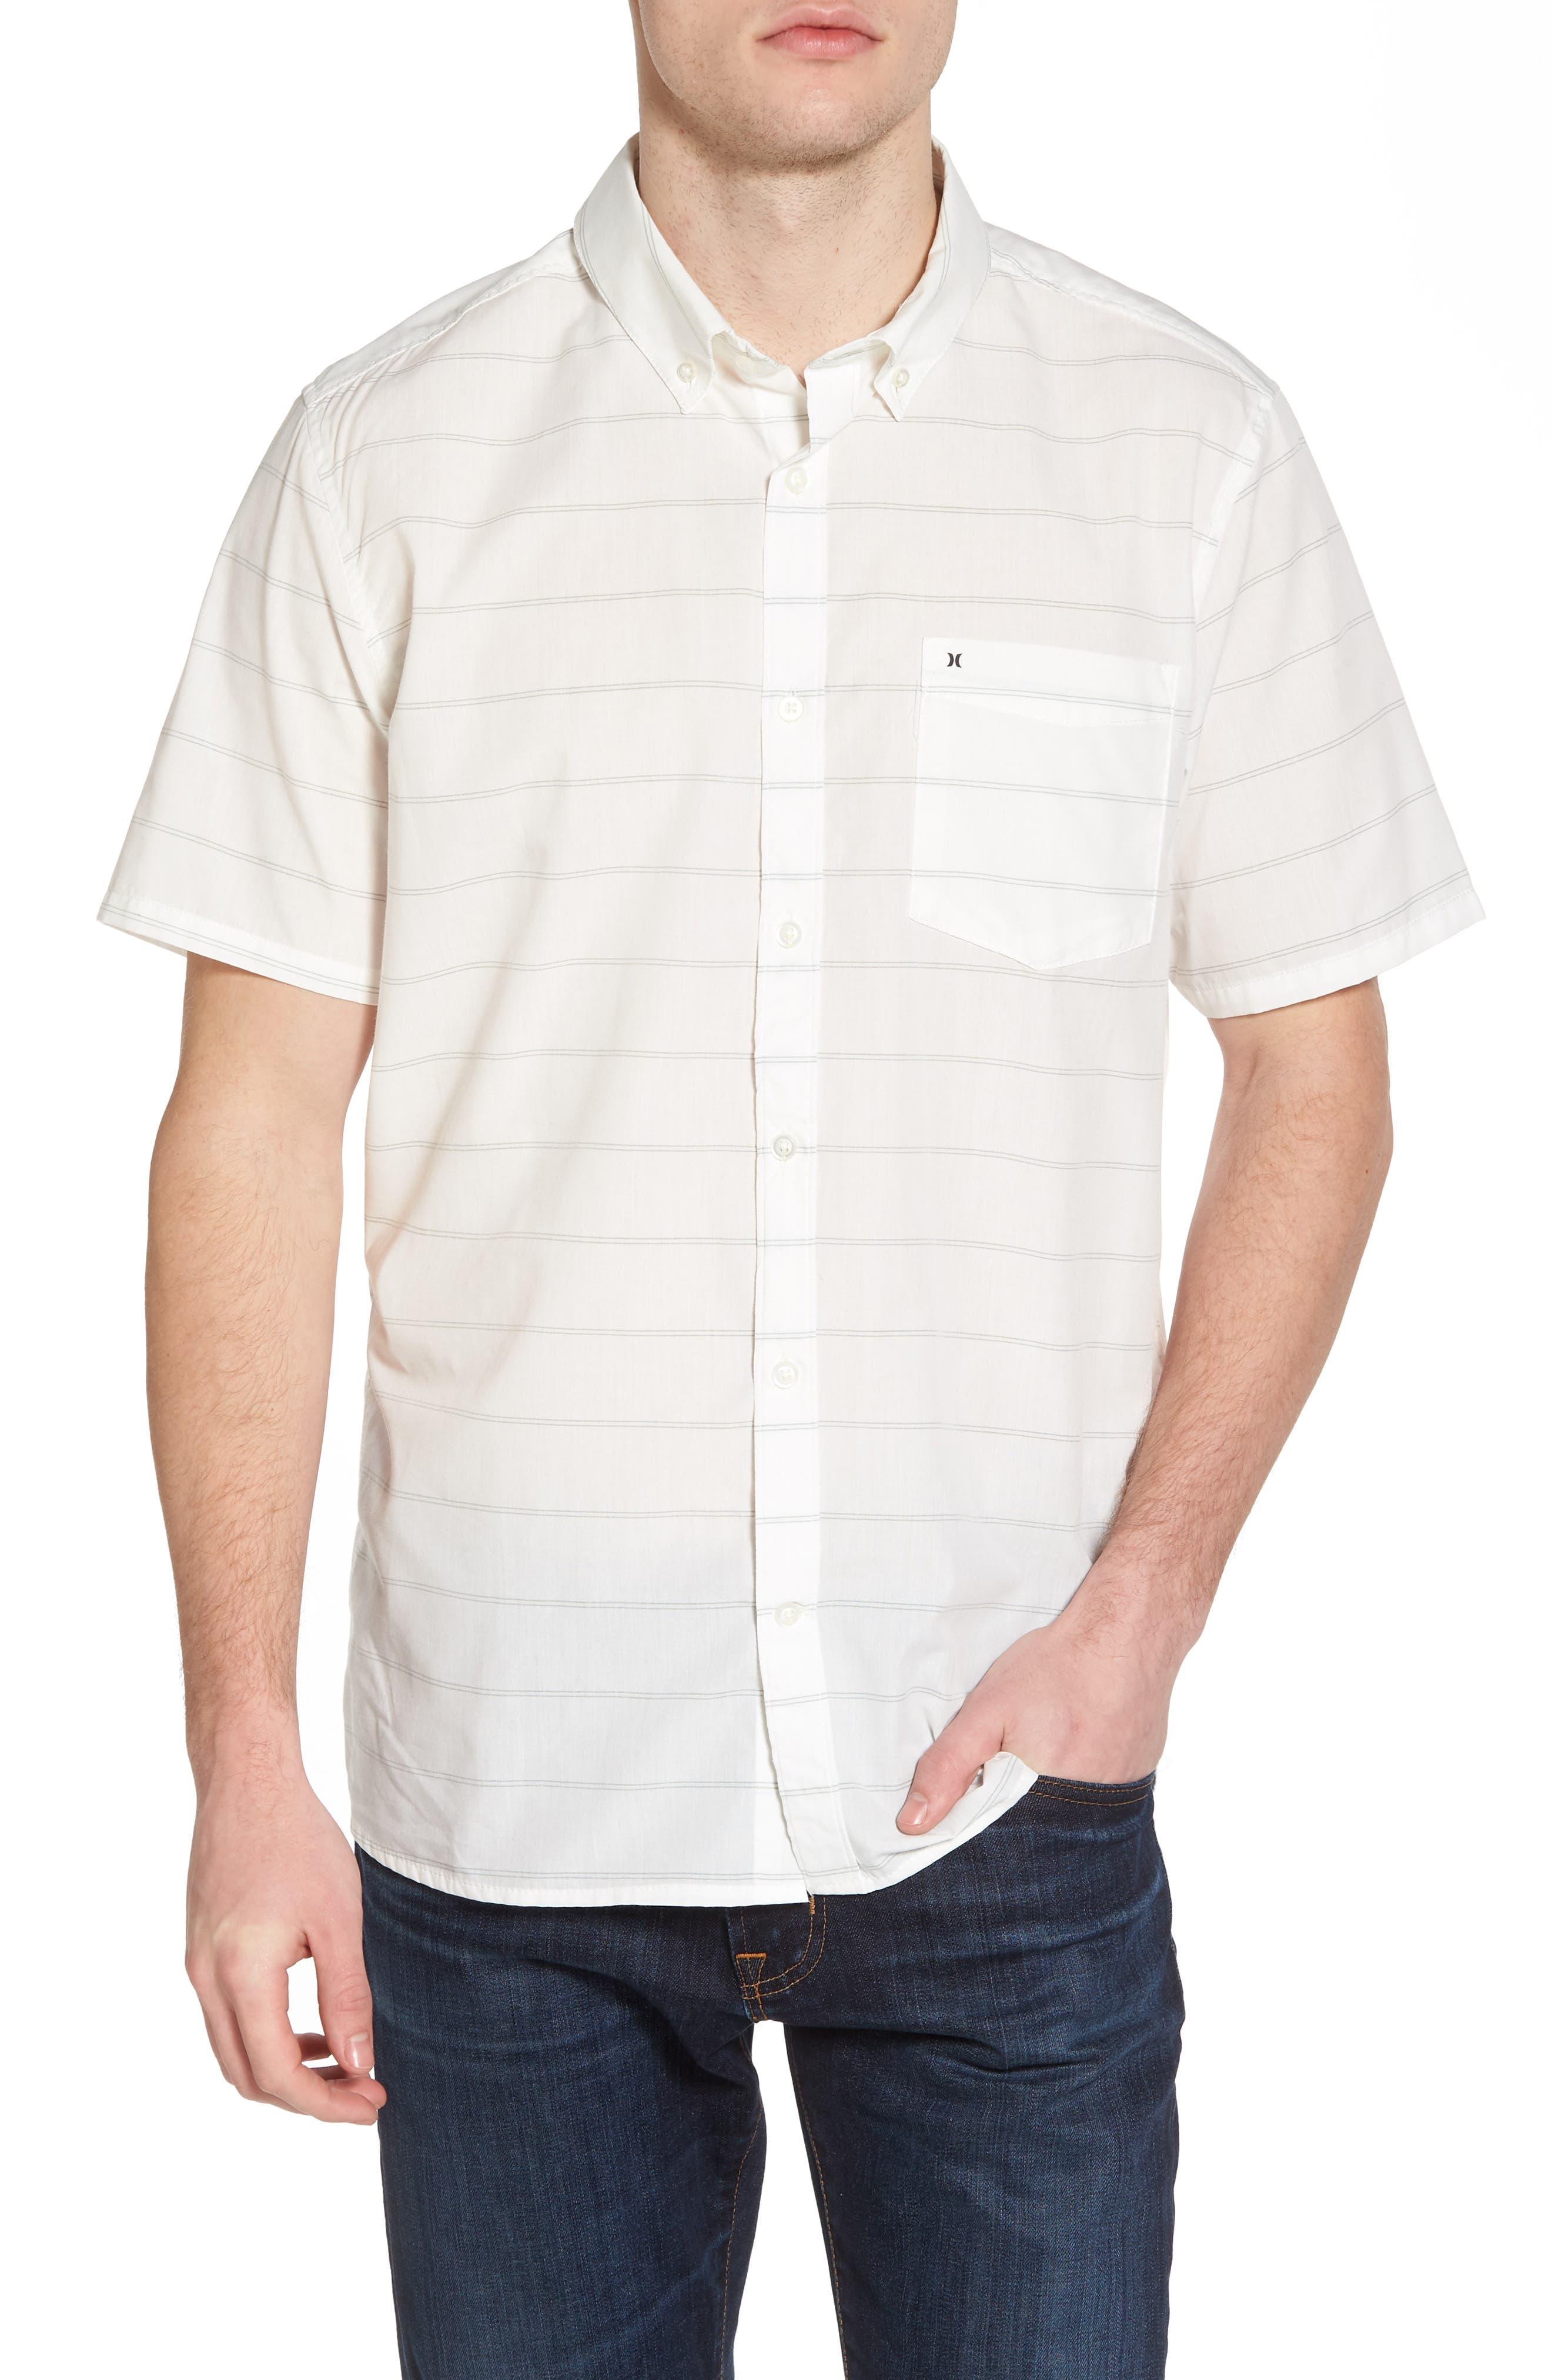 Reeder Dry Woven Shirt,                             Main thumbnail 1, color,                             133